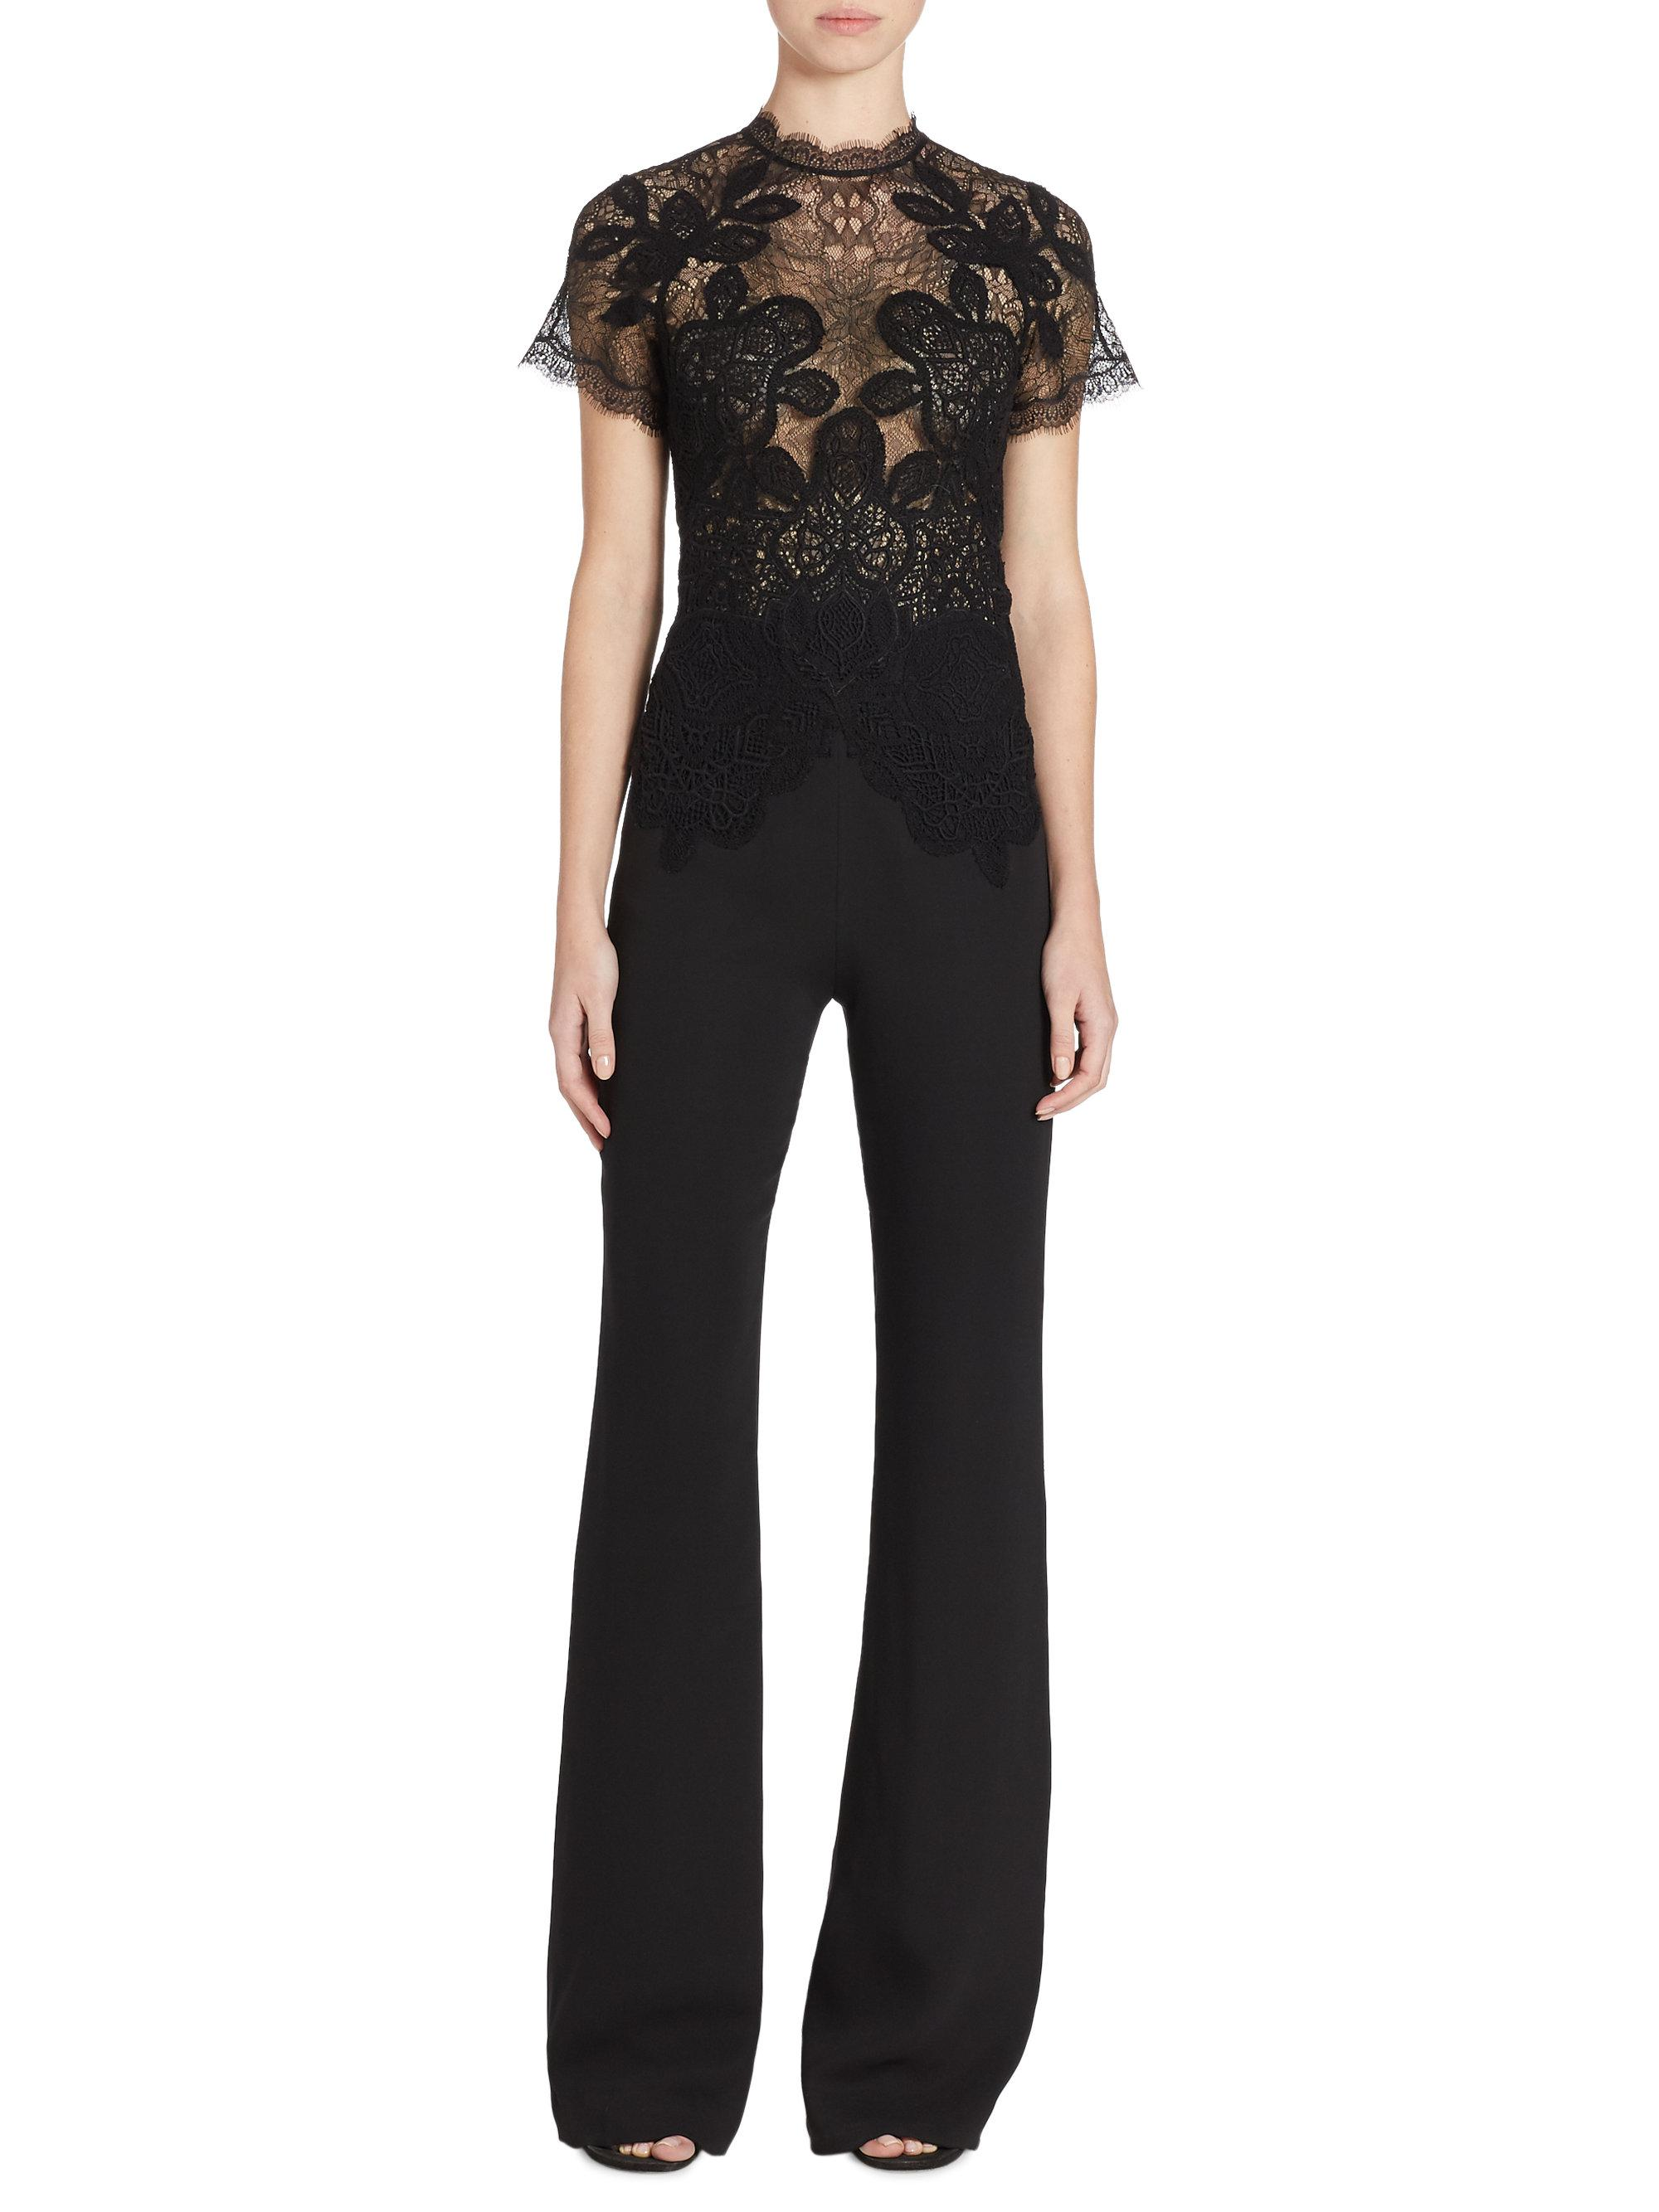 6ce65484943e Lyst - Jonathan Simkhai Short Sleeve Lace Jumpsuit in Black